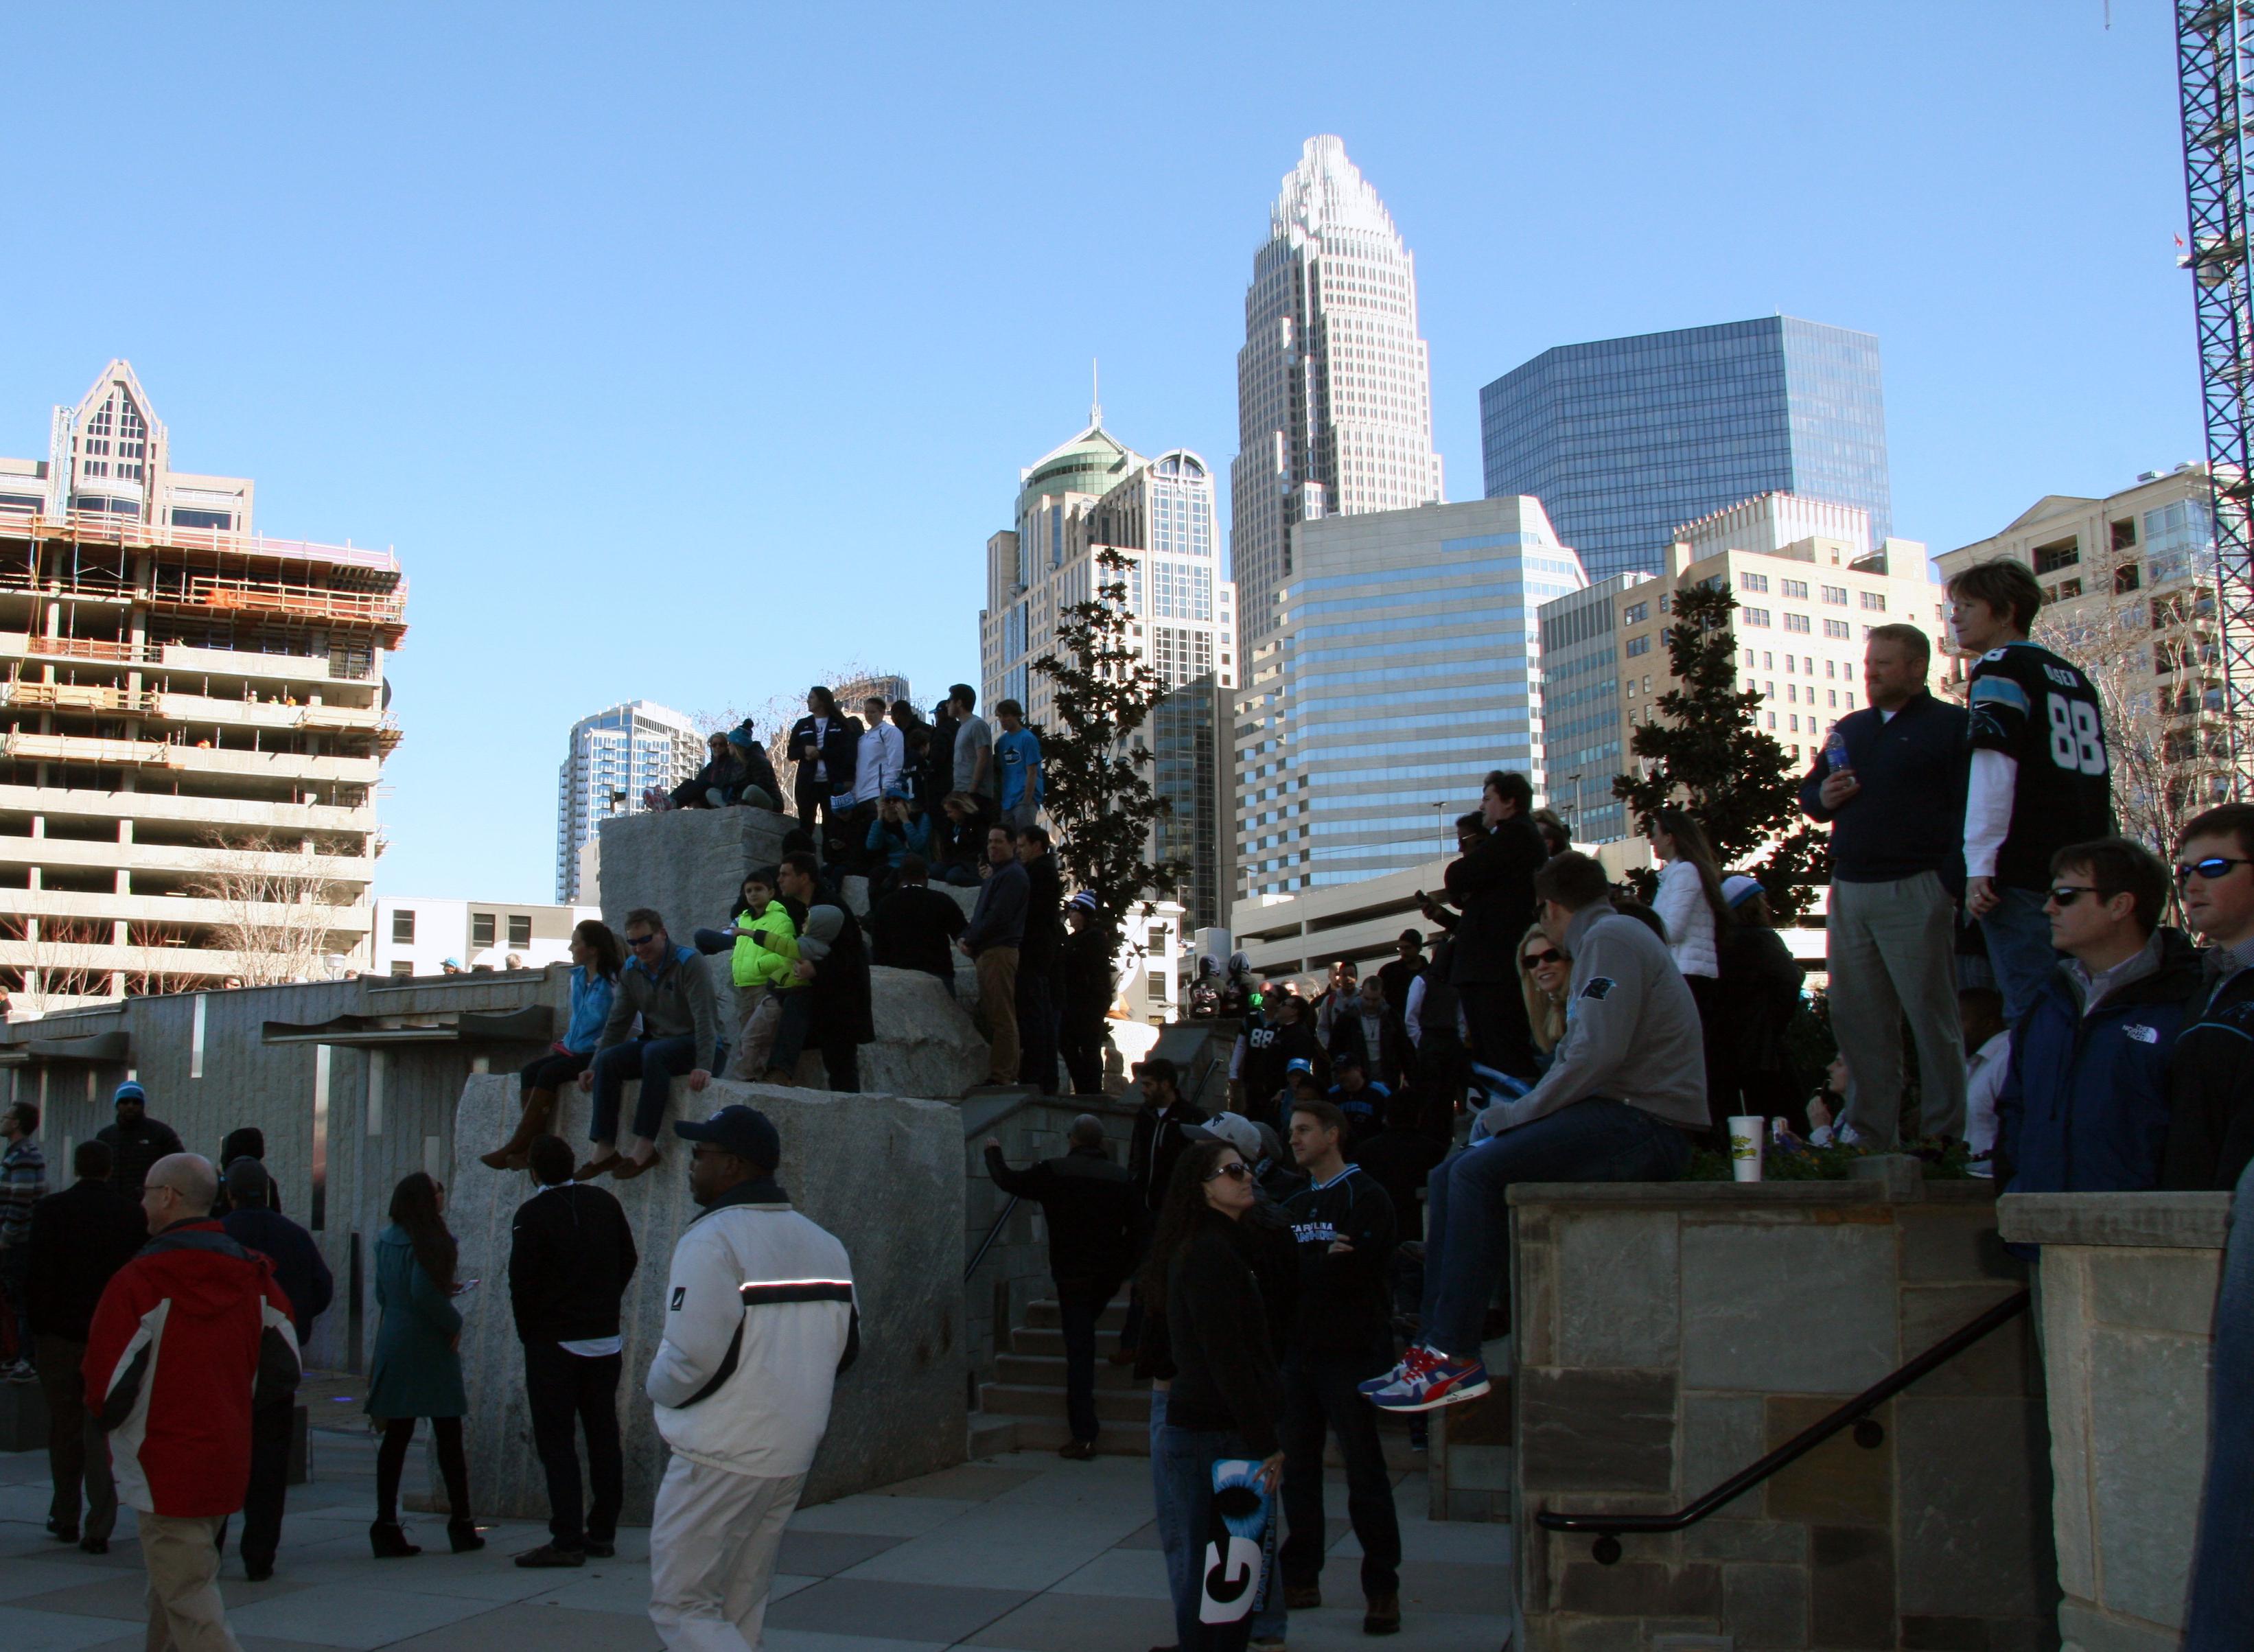 crowd and skyline